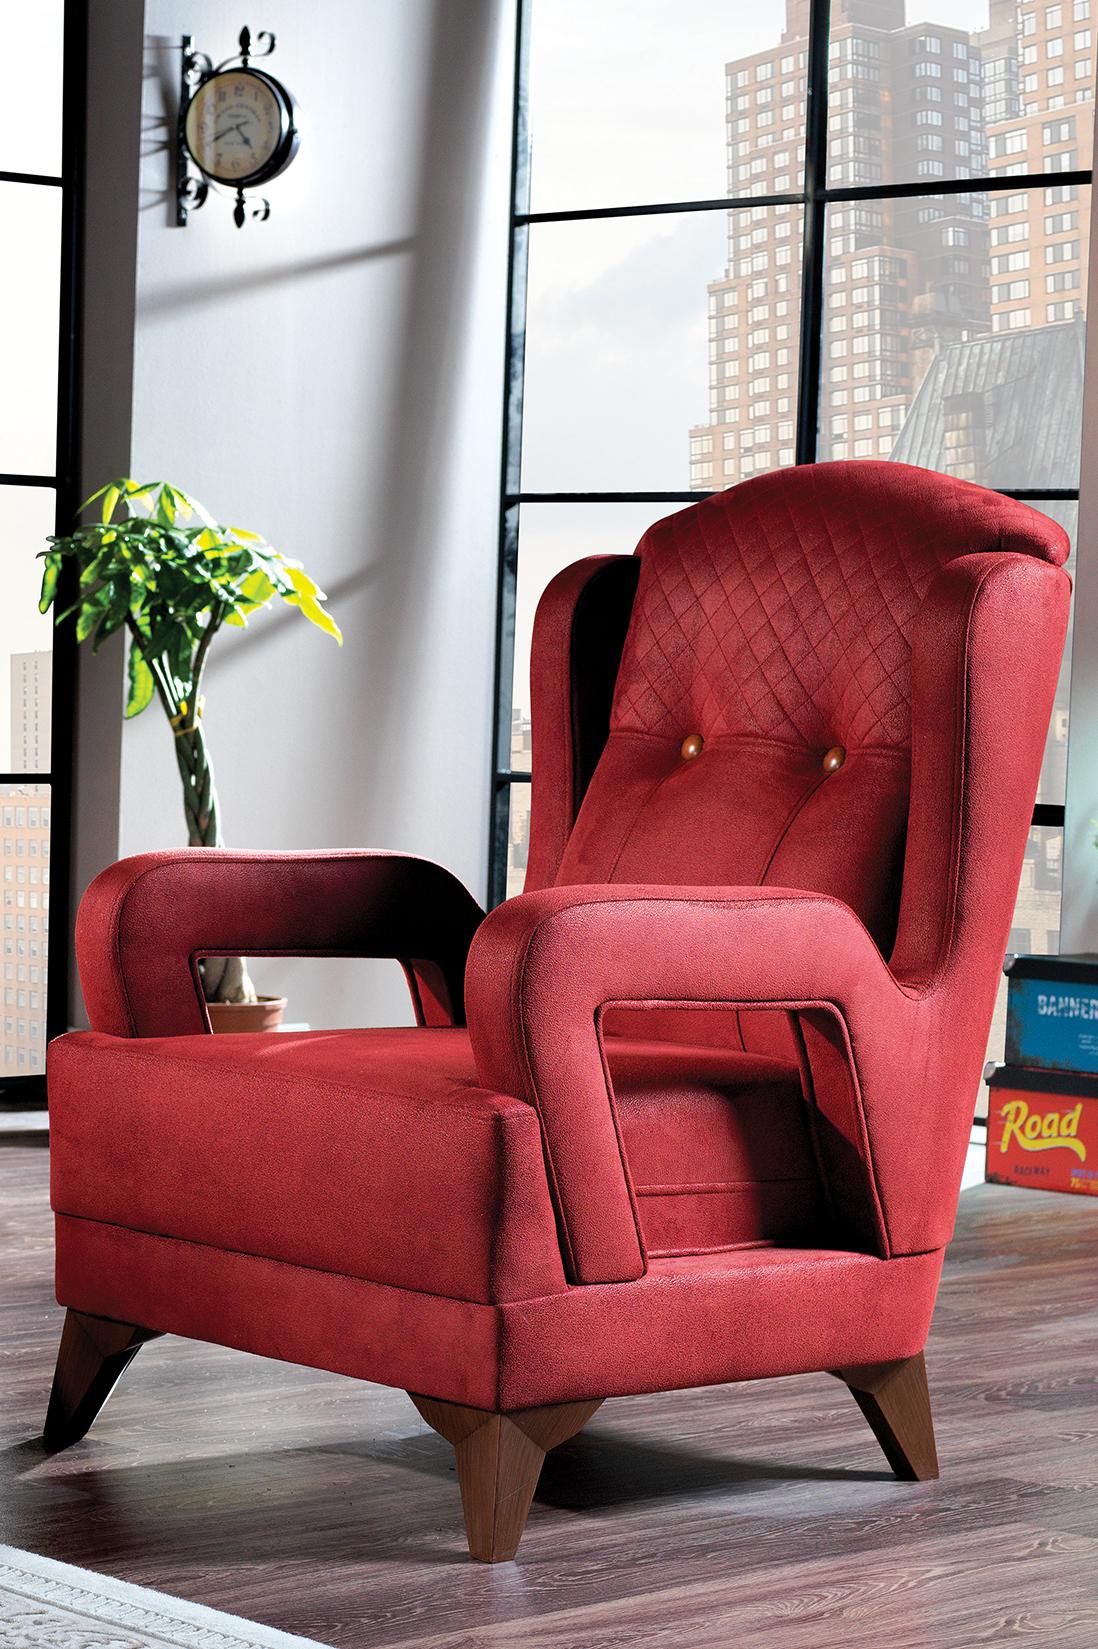 oscar avangarde sofa set 3 3 1 yuvam m belhaus in wuppertal cilek offizieller h ndler in europa. Black Bedroom Furniture Sets. Home Design Ideas